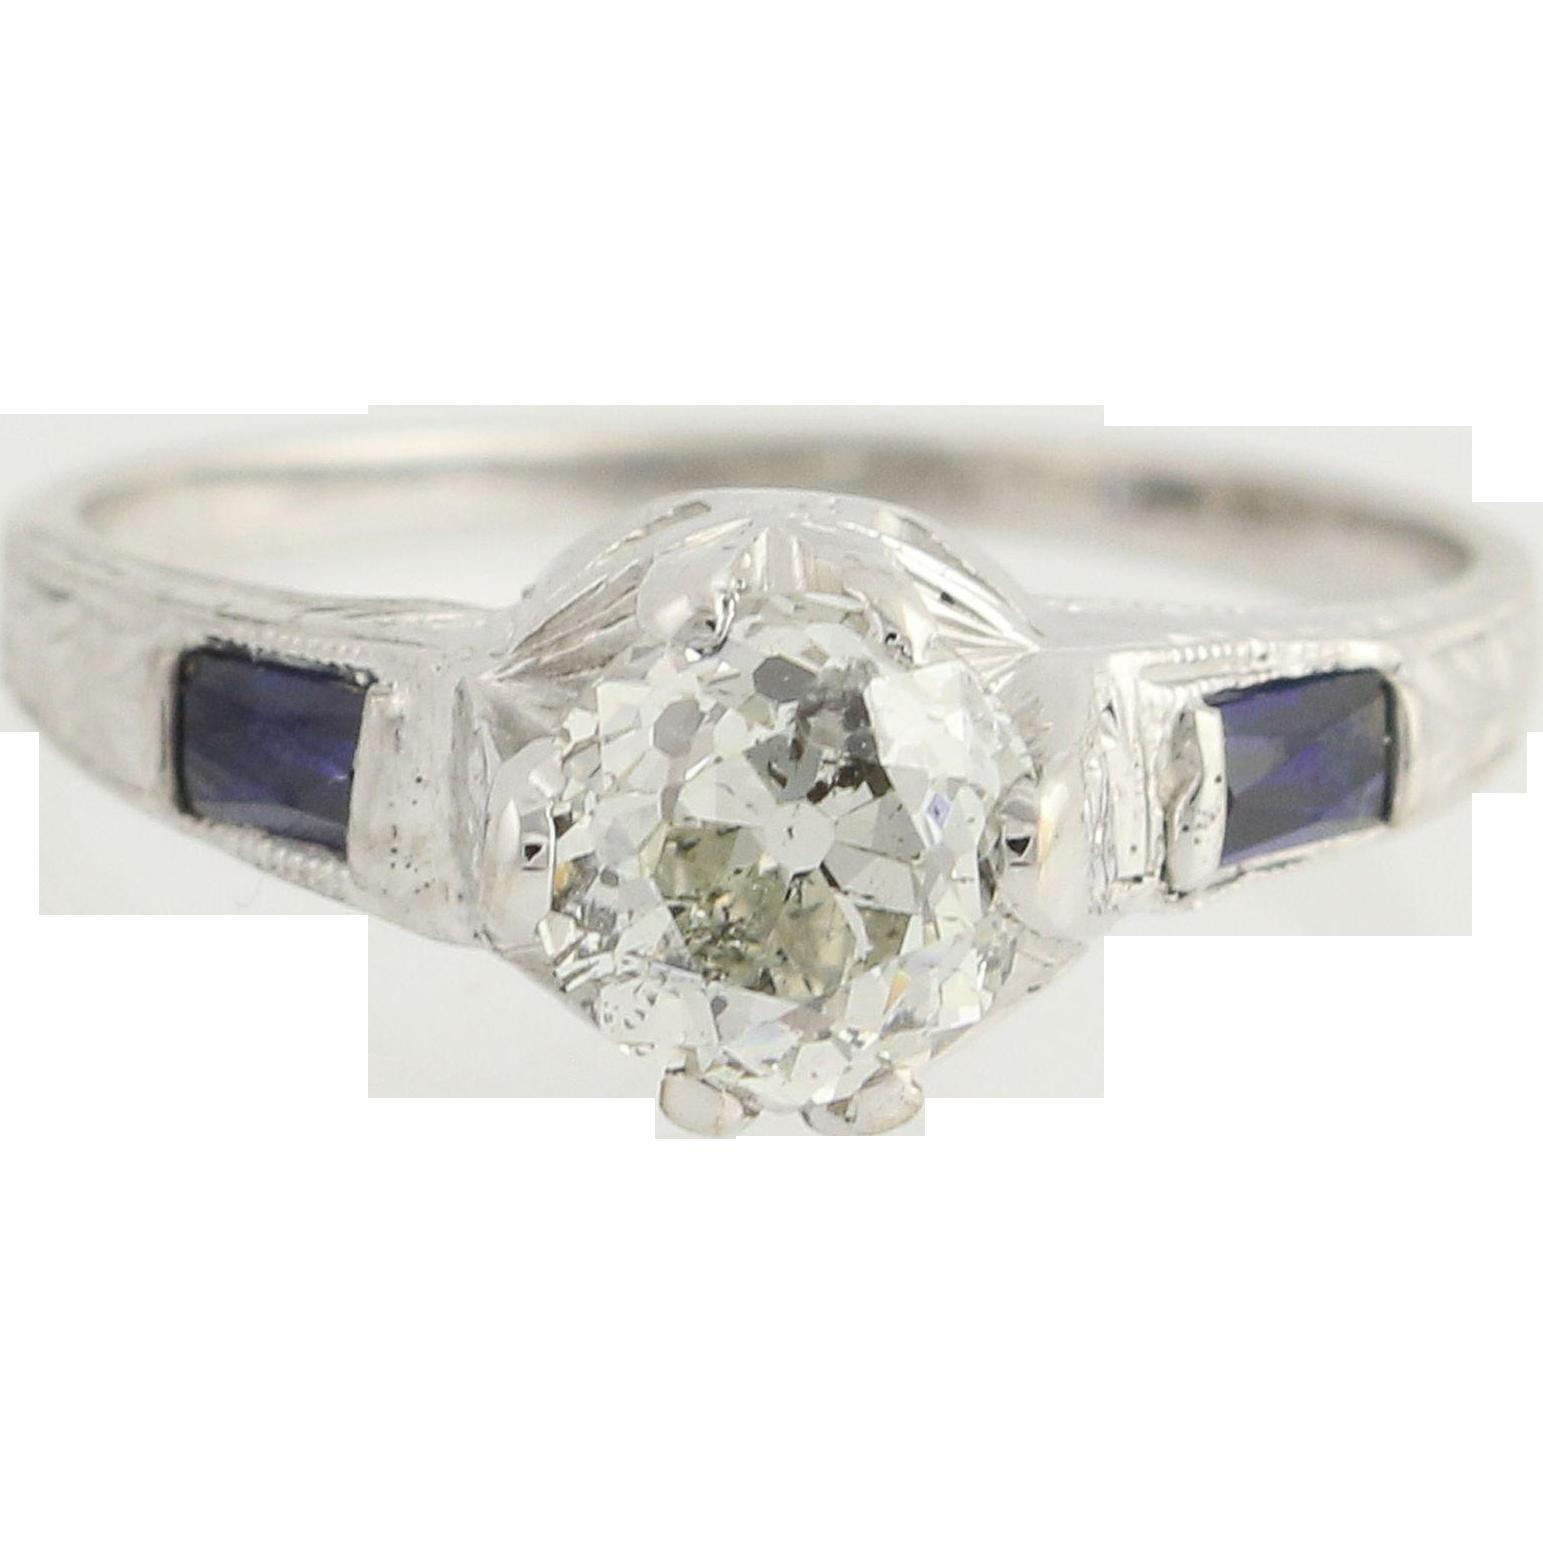 Art Deco Diamond & Syn. Sapphire Engagement Ring - 18k White Gold 1.01ct